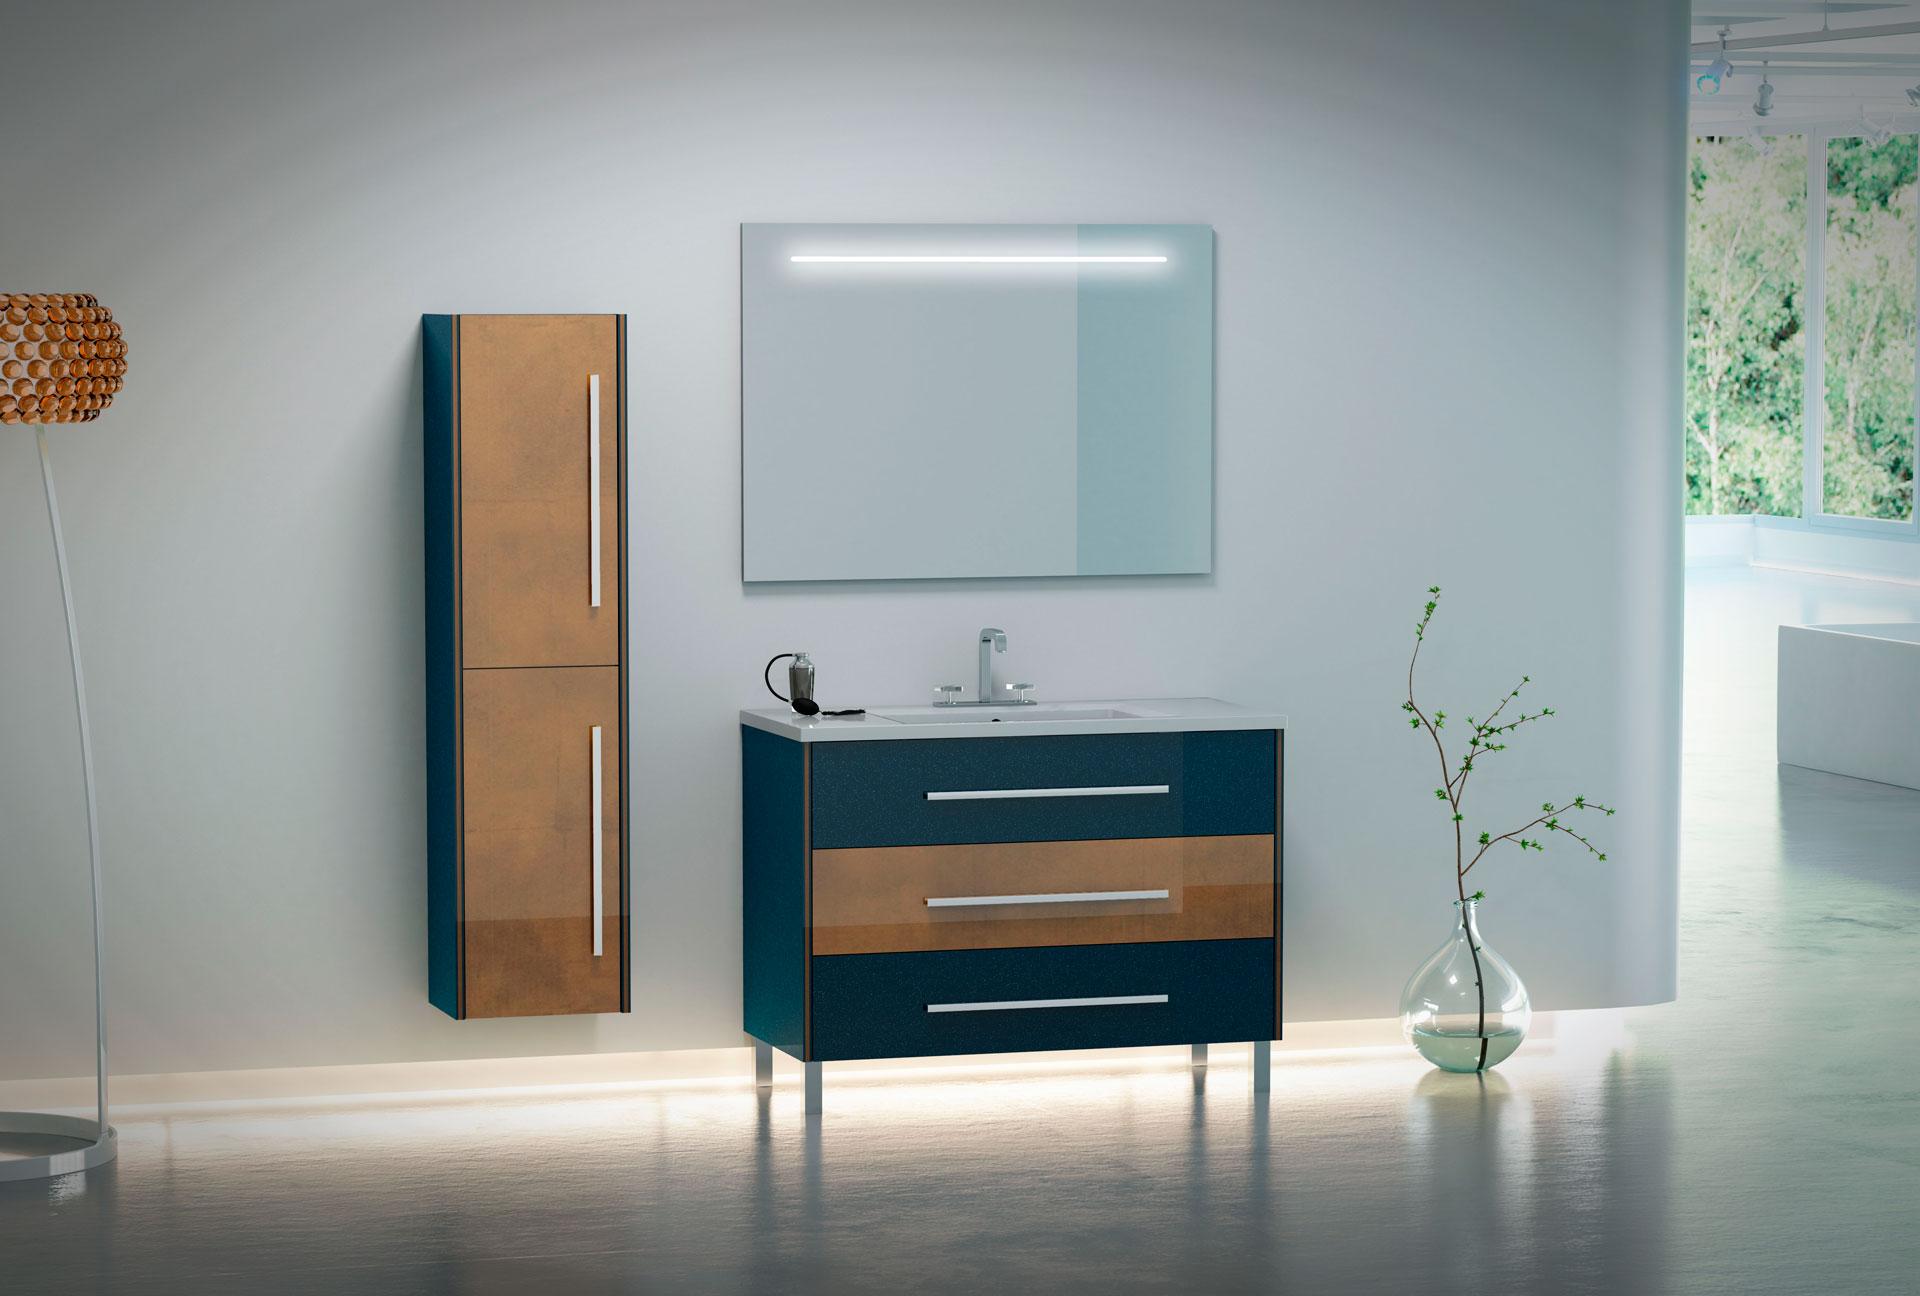 Infografias 3D ambiente baño